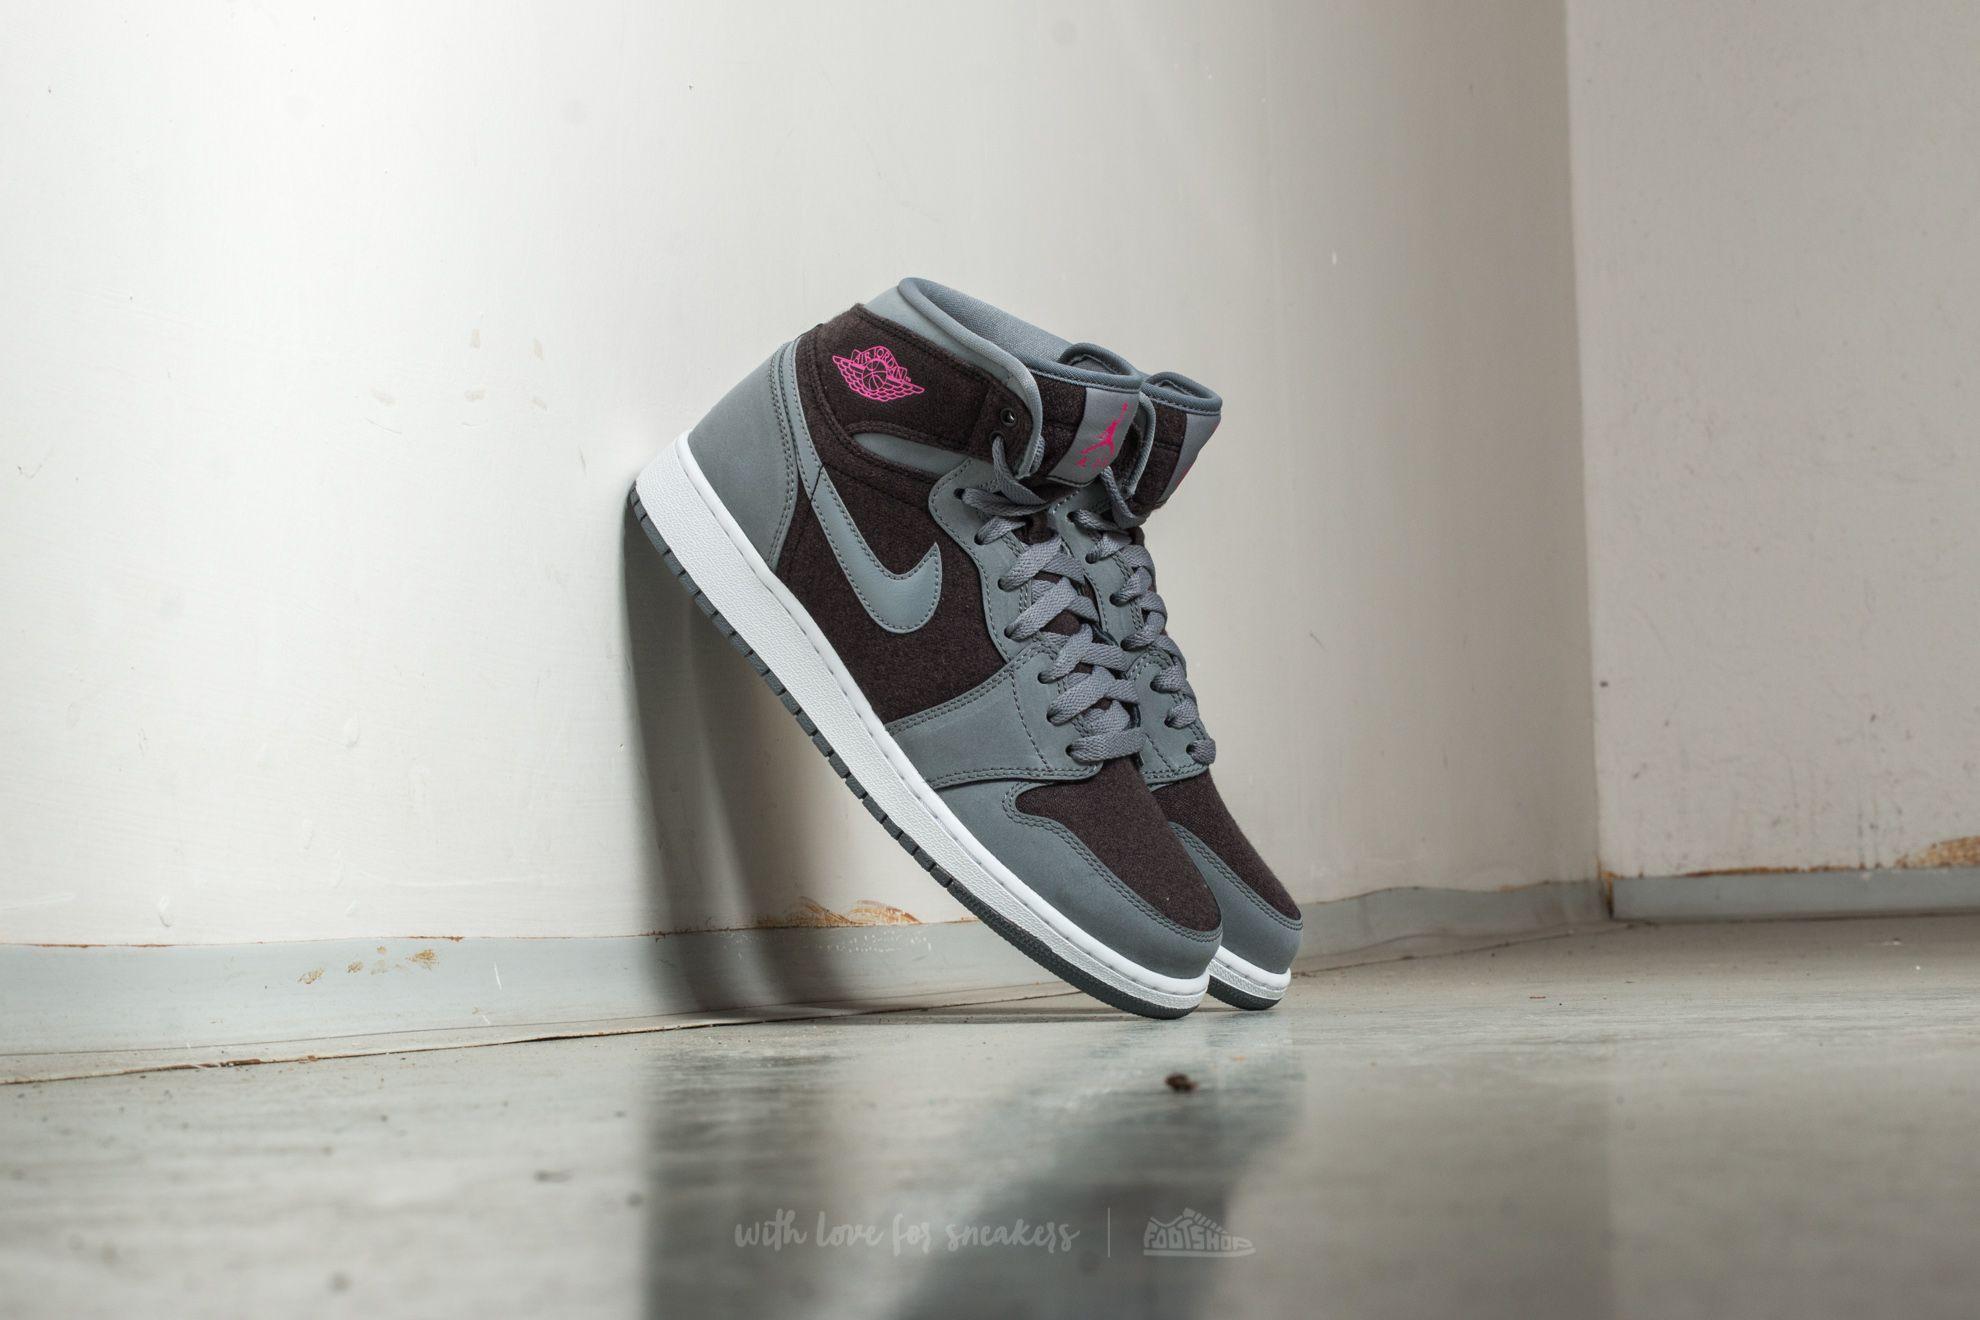 Air Jordan 1 Retro High (GG) Cool Grey/ Vivid Pink-Black